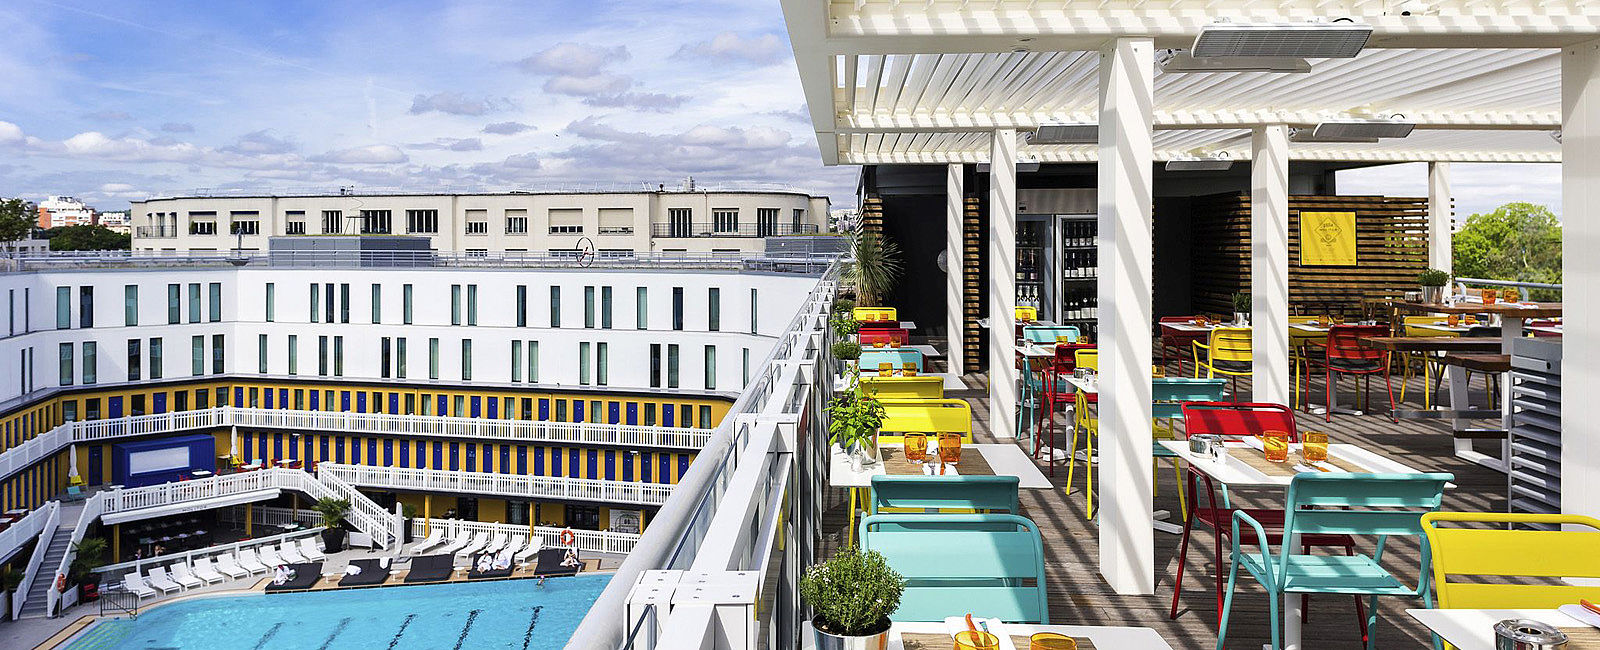 Hotel Molitor Paris Connoisseur Circle Hoteltest